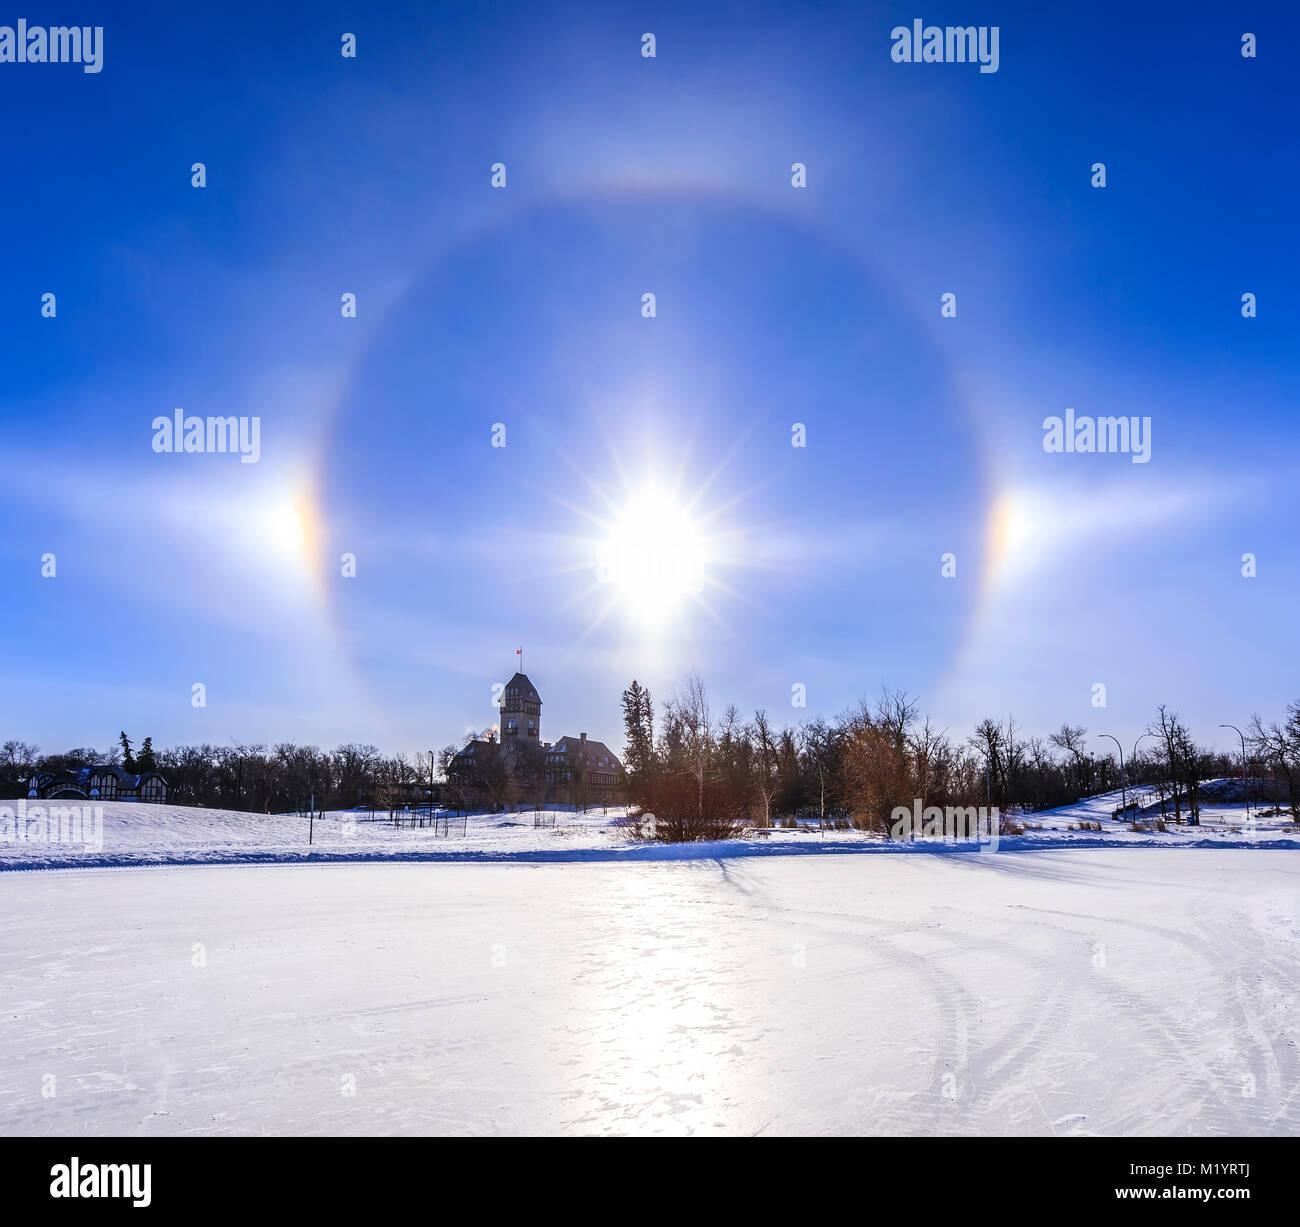 Sun dogs with halo over Assiniboine Park, Winnipeg, Manitoba, Canada. - Stock Image